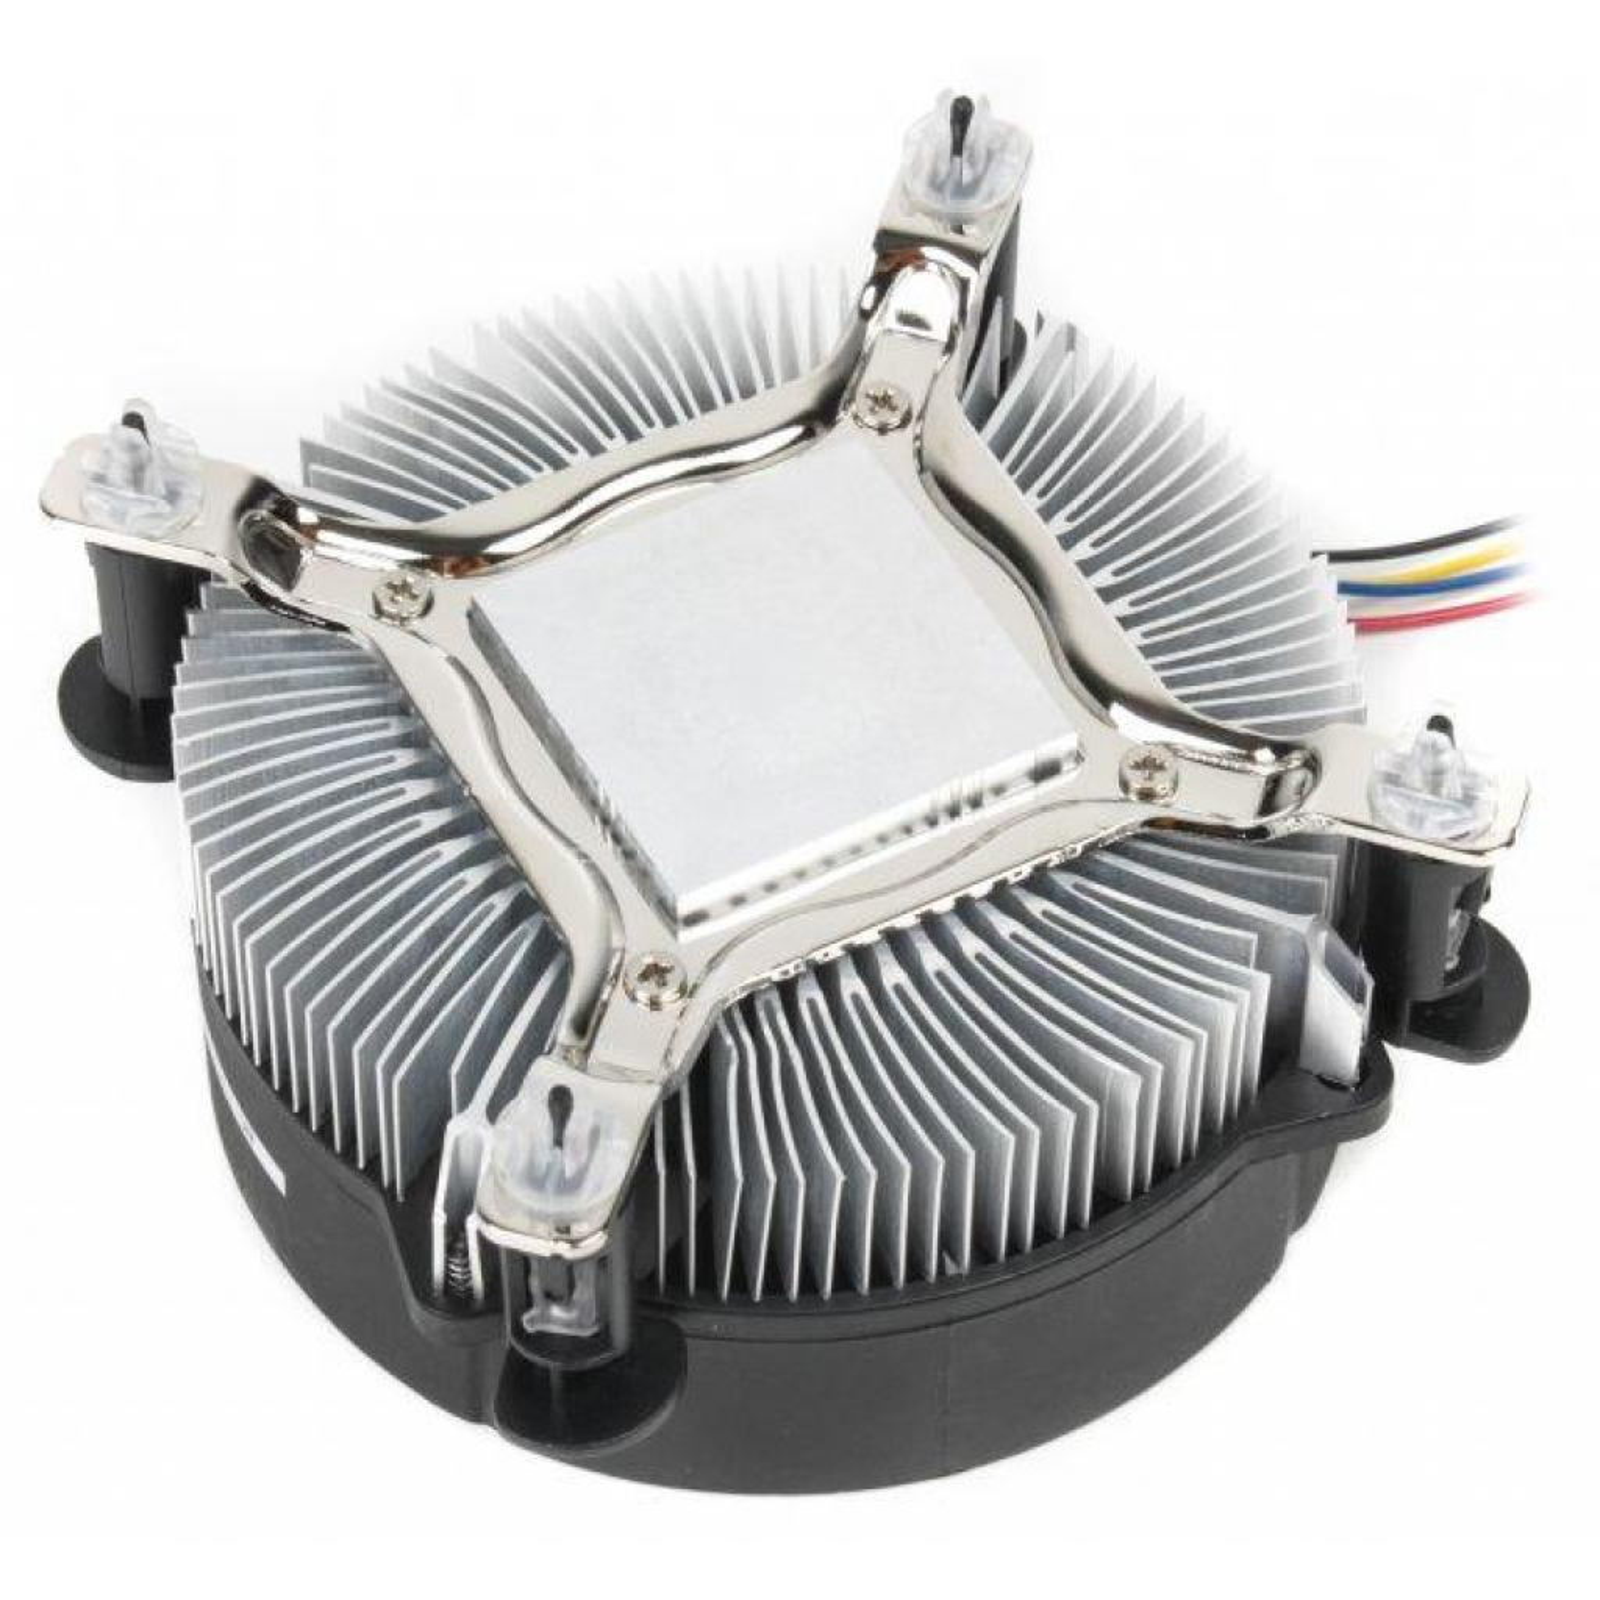 Кулер для процессора Titan DC-156V925X/RPW изображение 2